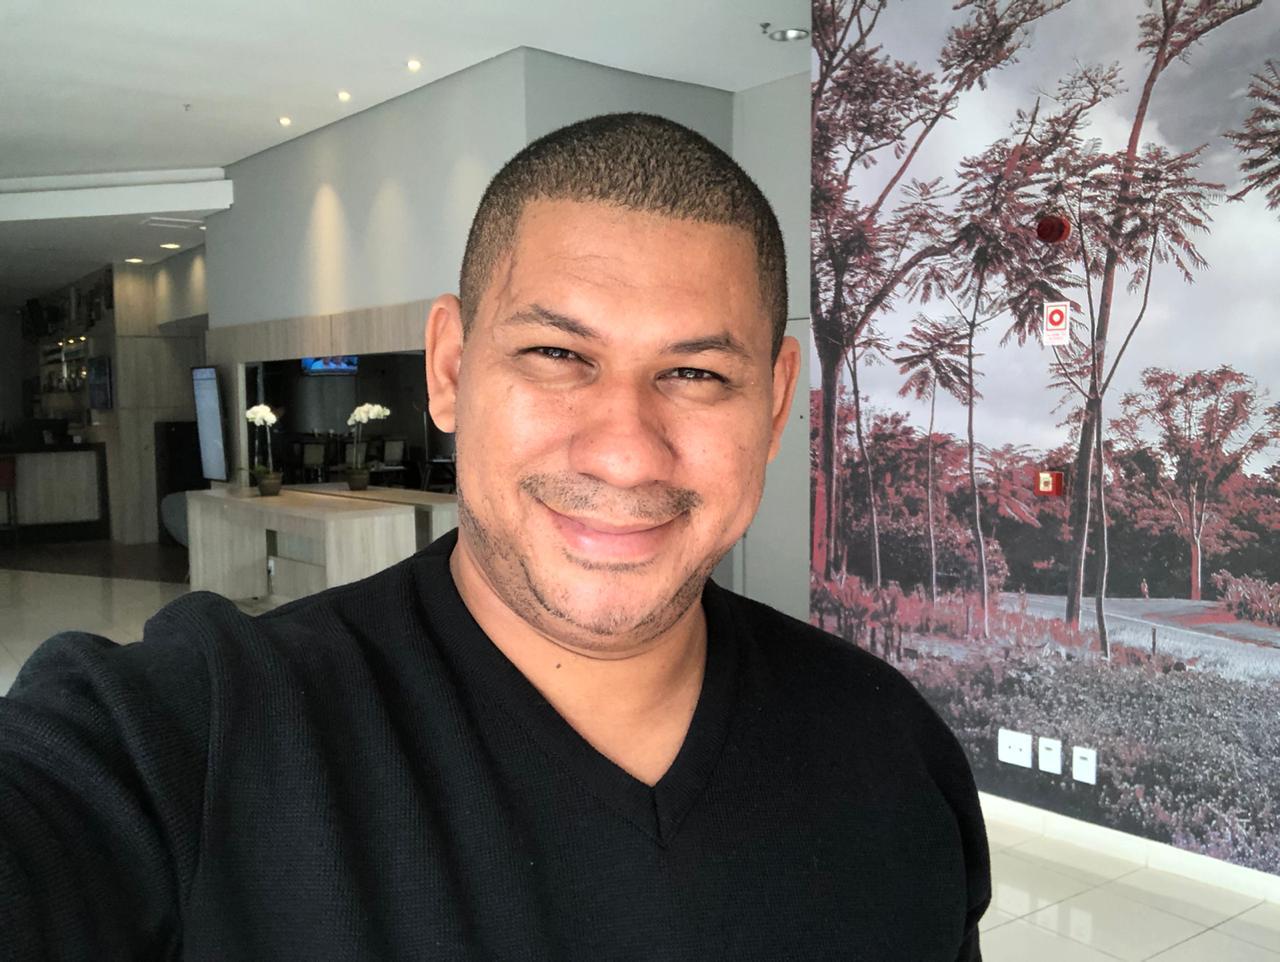 DEIVISON ANTONIO GOMES GUERREIRO